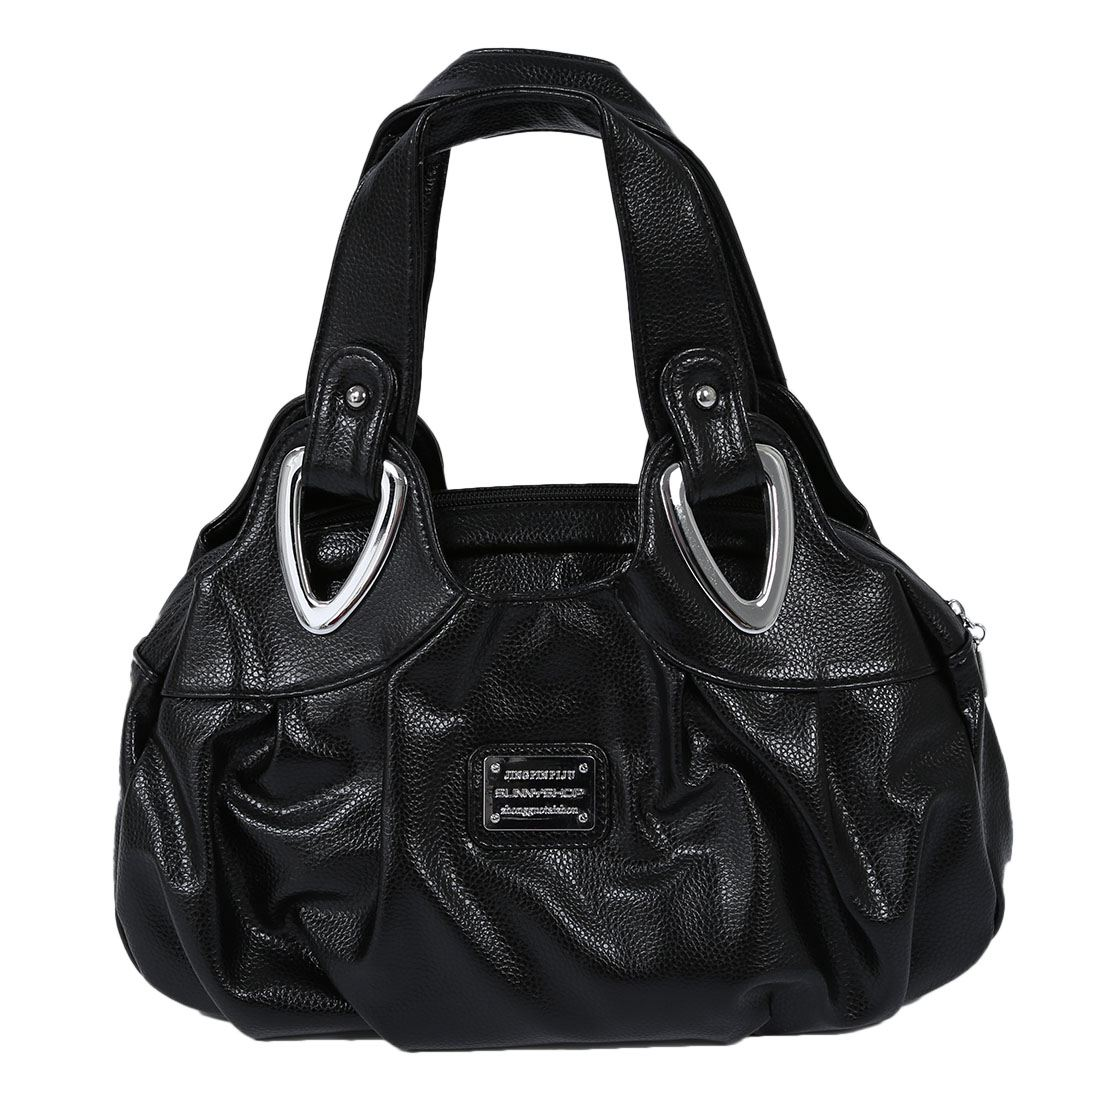 Fashion handbag Women PU leather Bag Tote Bag Handbags Satchel -Matte Black